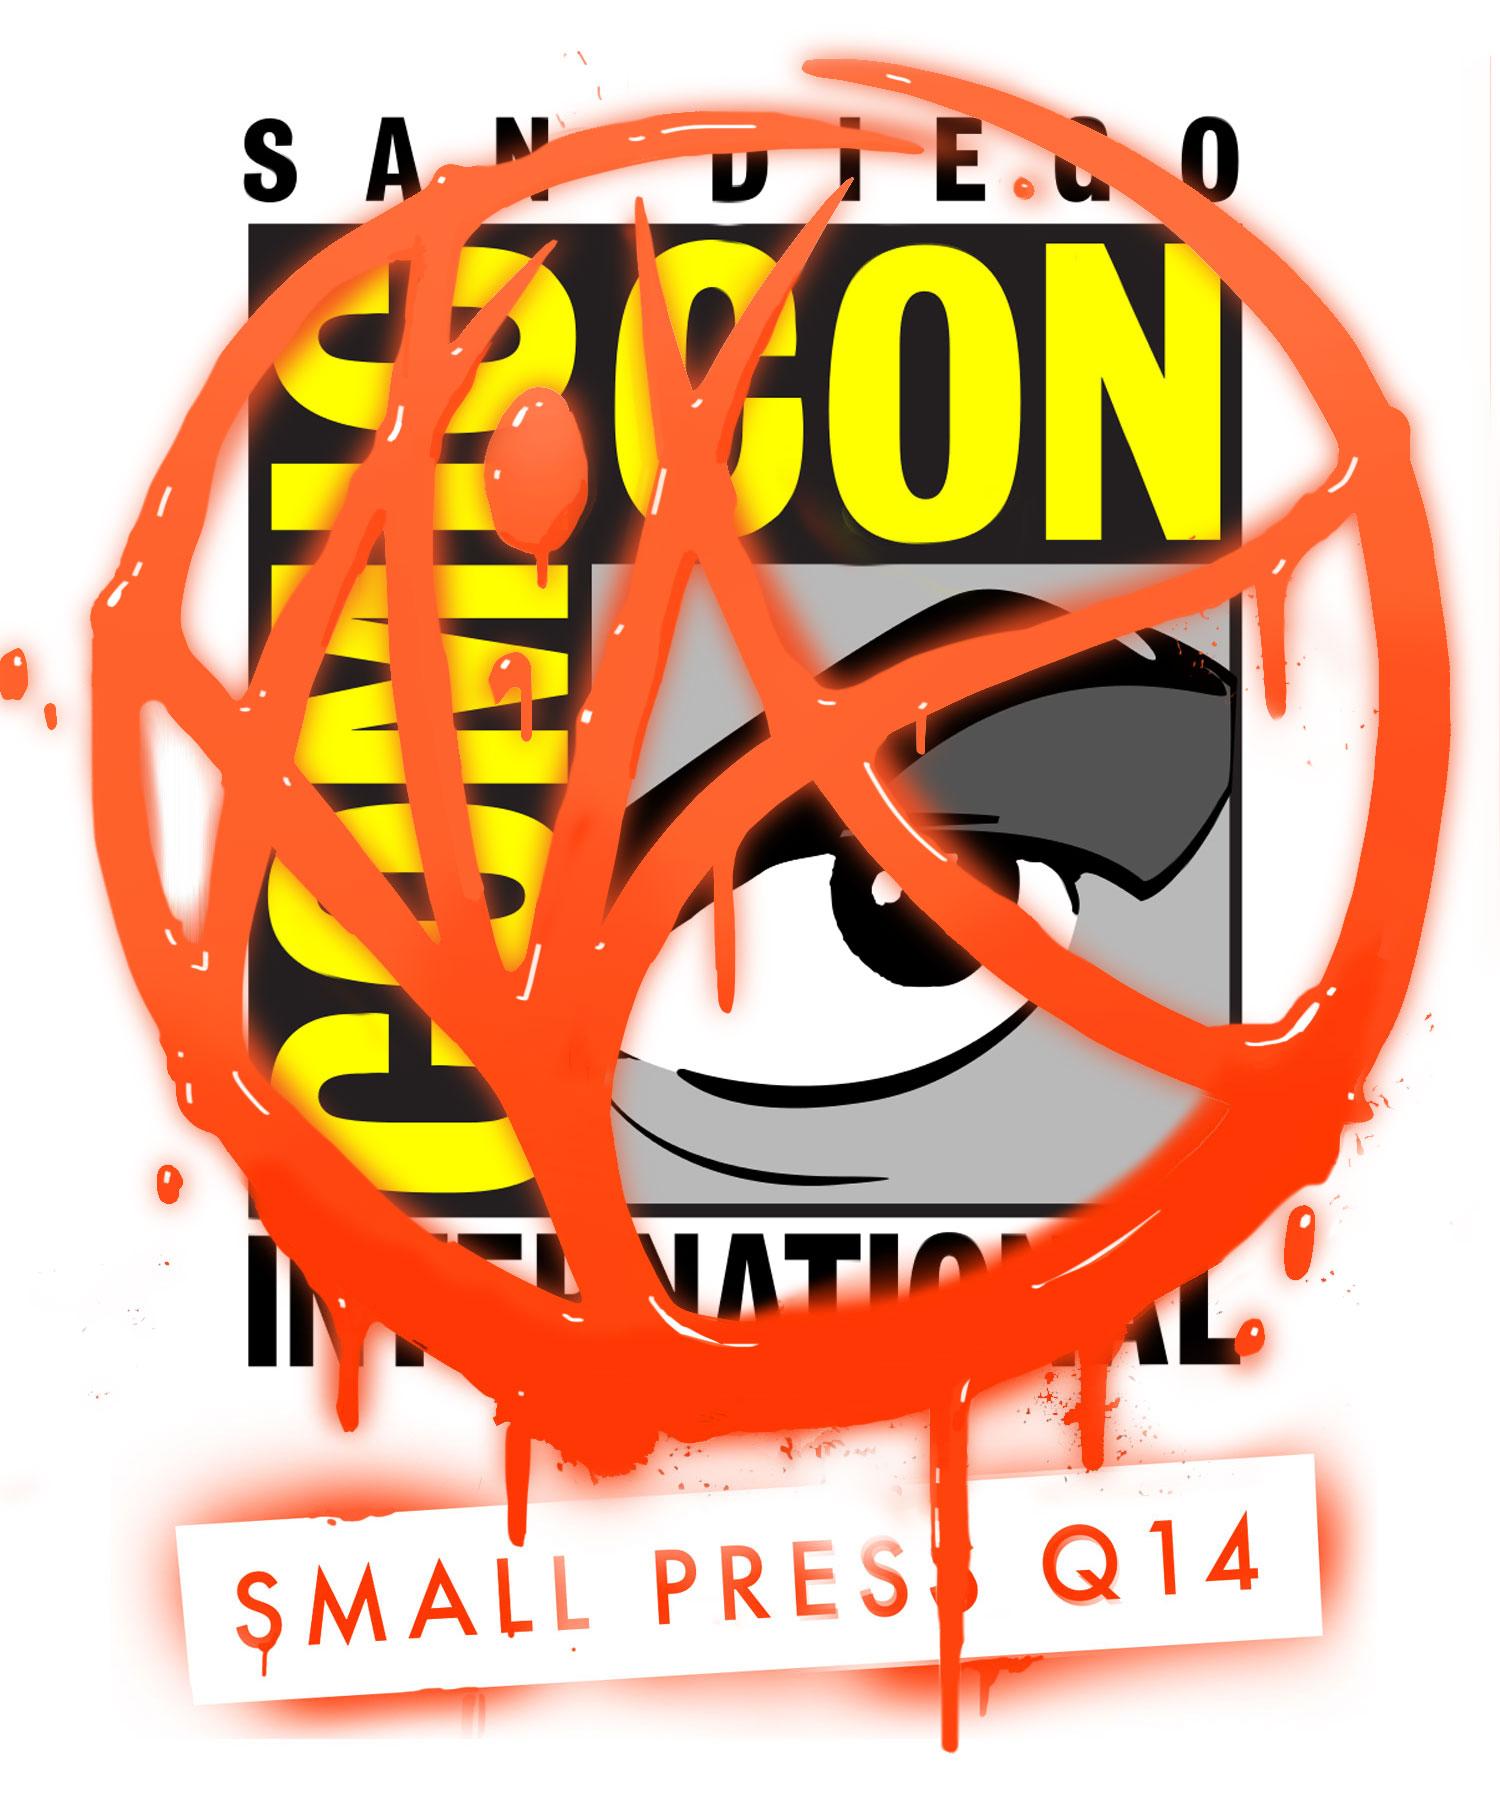 1740727_149965904571_ComicCon.jpg